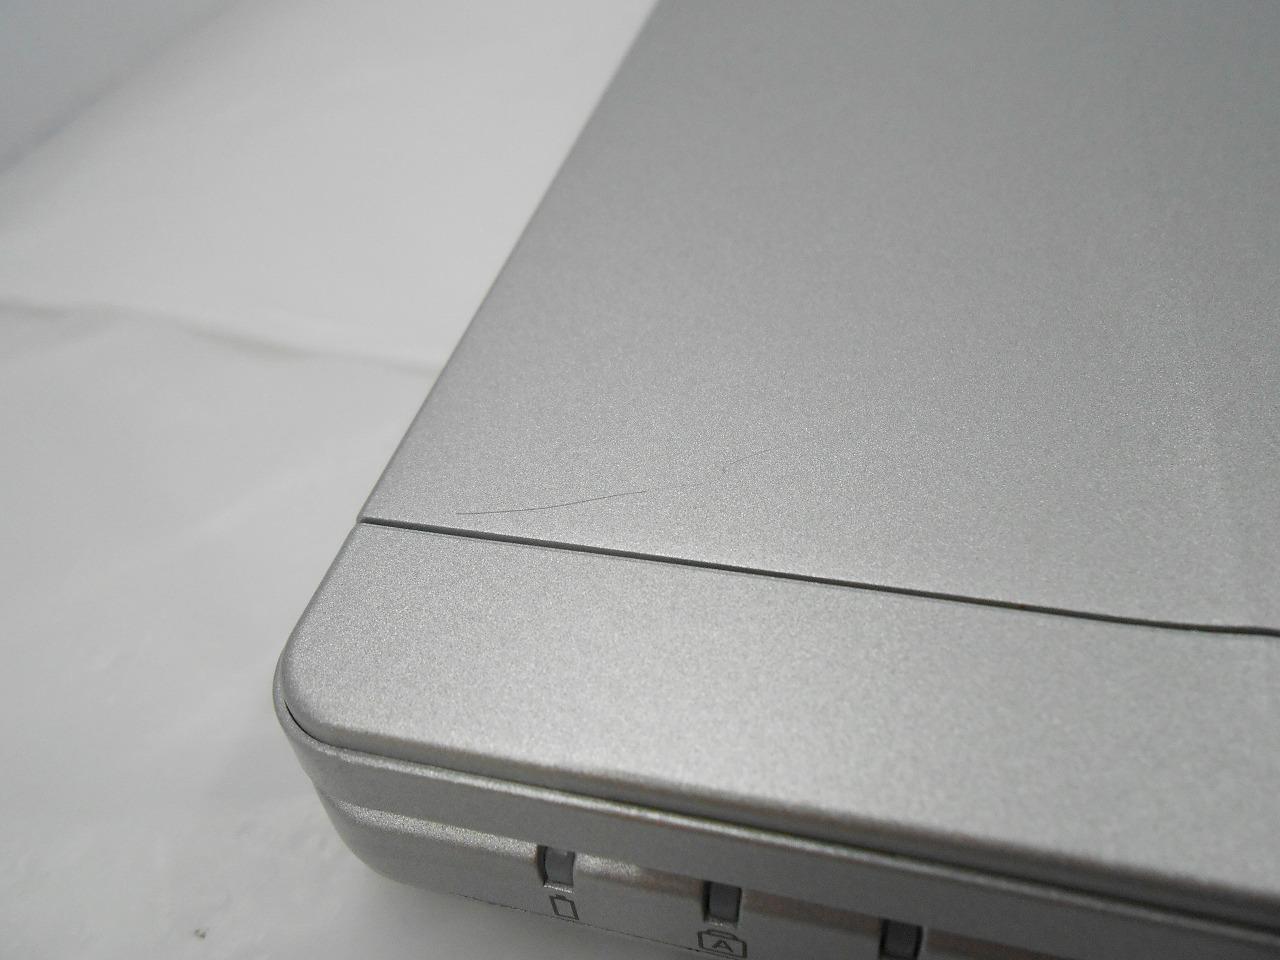 【中古】Panasonic Let'snote CF-SZ5/2016年モデル/Corei5 6300U 2.4GHz/メモリ4GB/SSD128GB/12インチ/Windows10Pro【3ヶ月保証】【足立店発送】